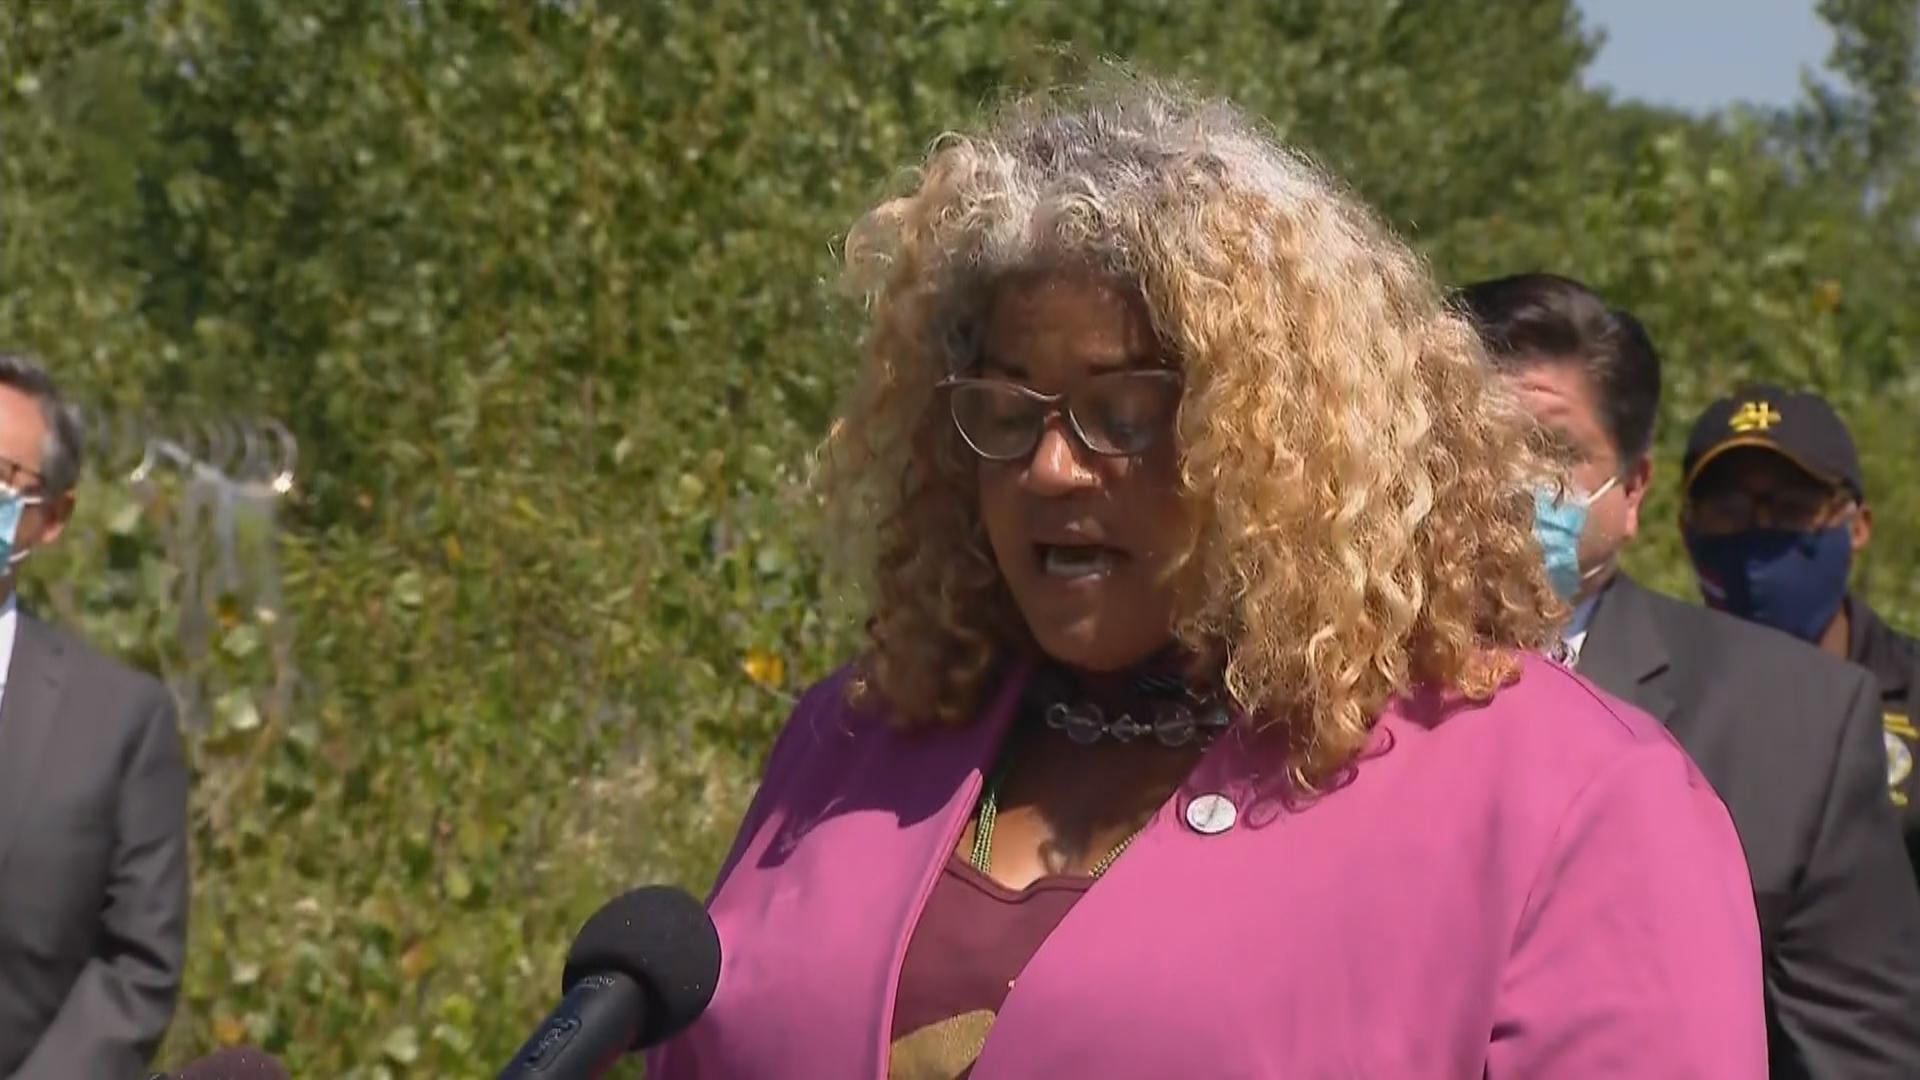 Erika Allen, a leader in Chicago's urban agriculture movement, has been the driving force behind Auburn Gresham's Green Era campus. (WTTW News)